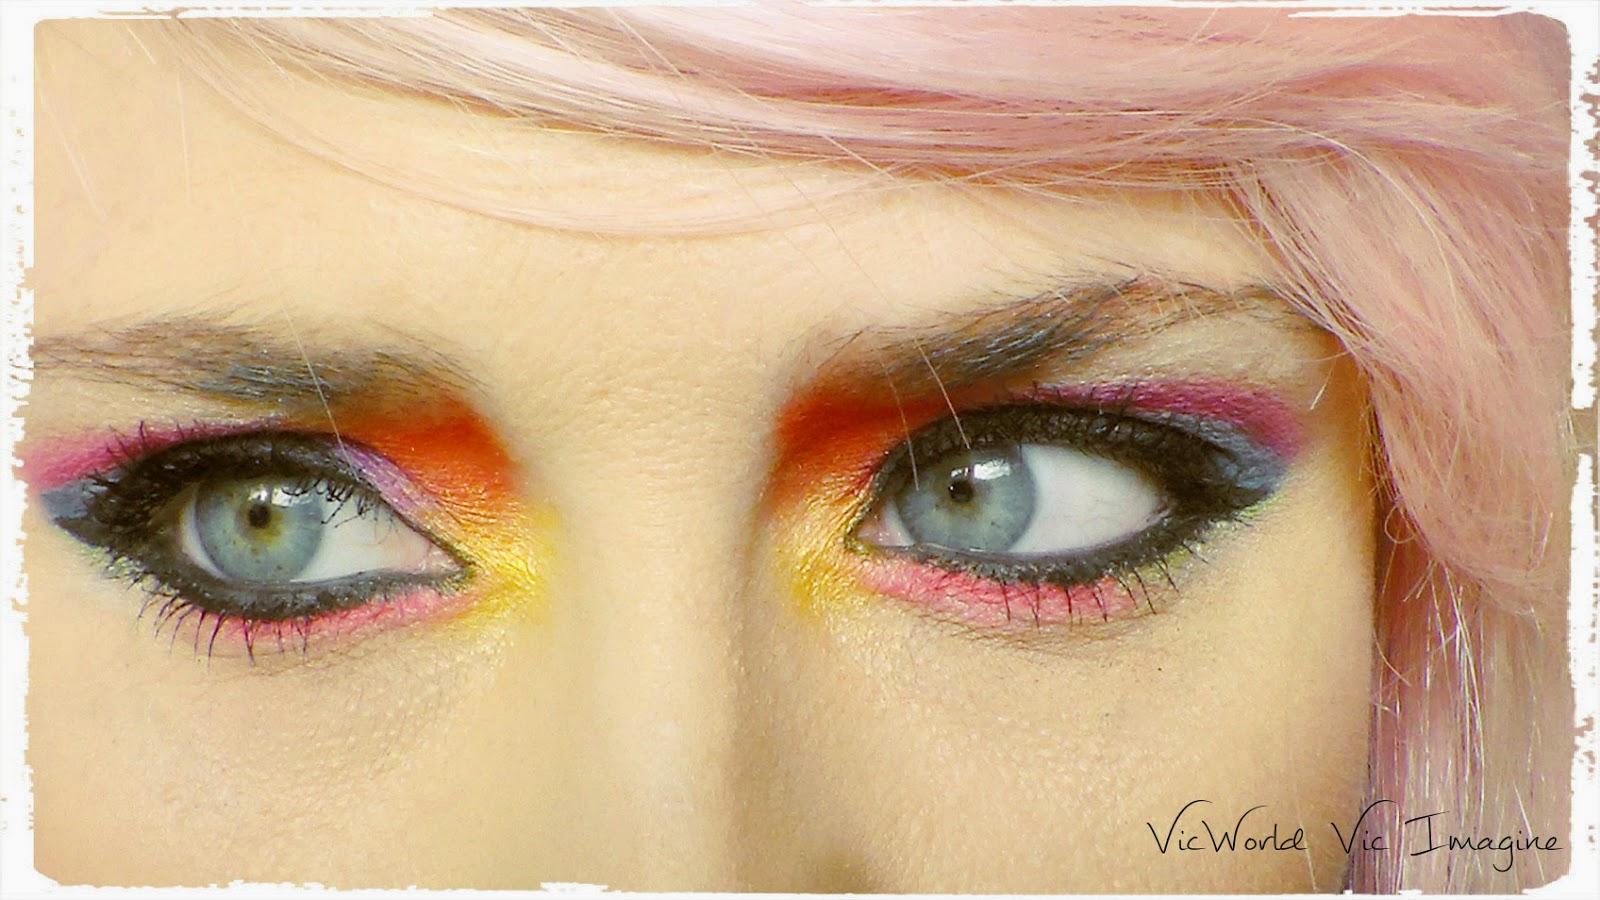 Rojo,rosa,morado,azul,amarillo,negro,blanco,fantasia,